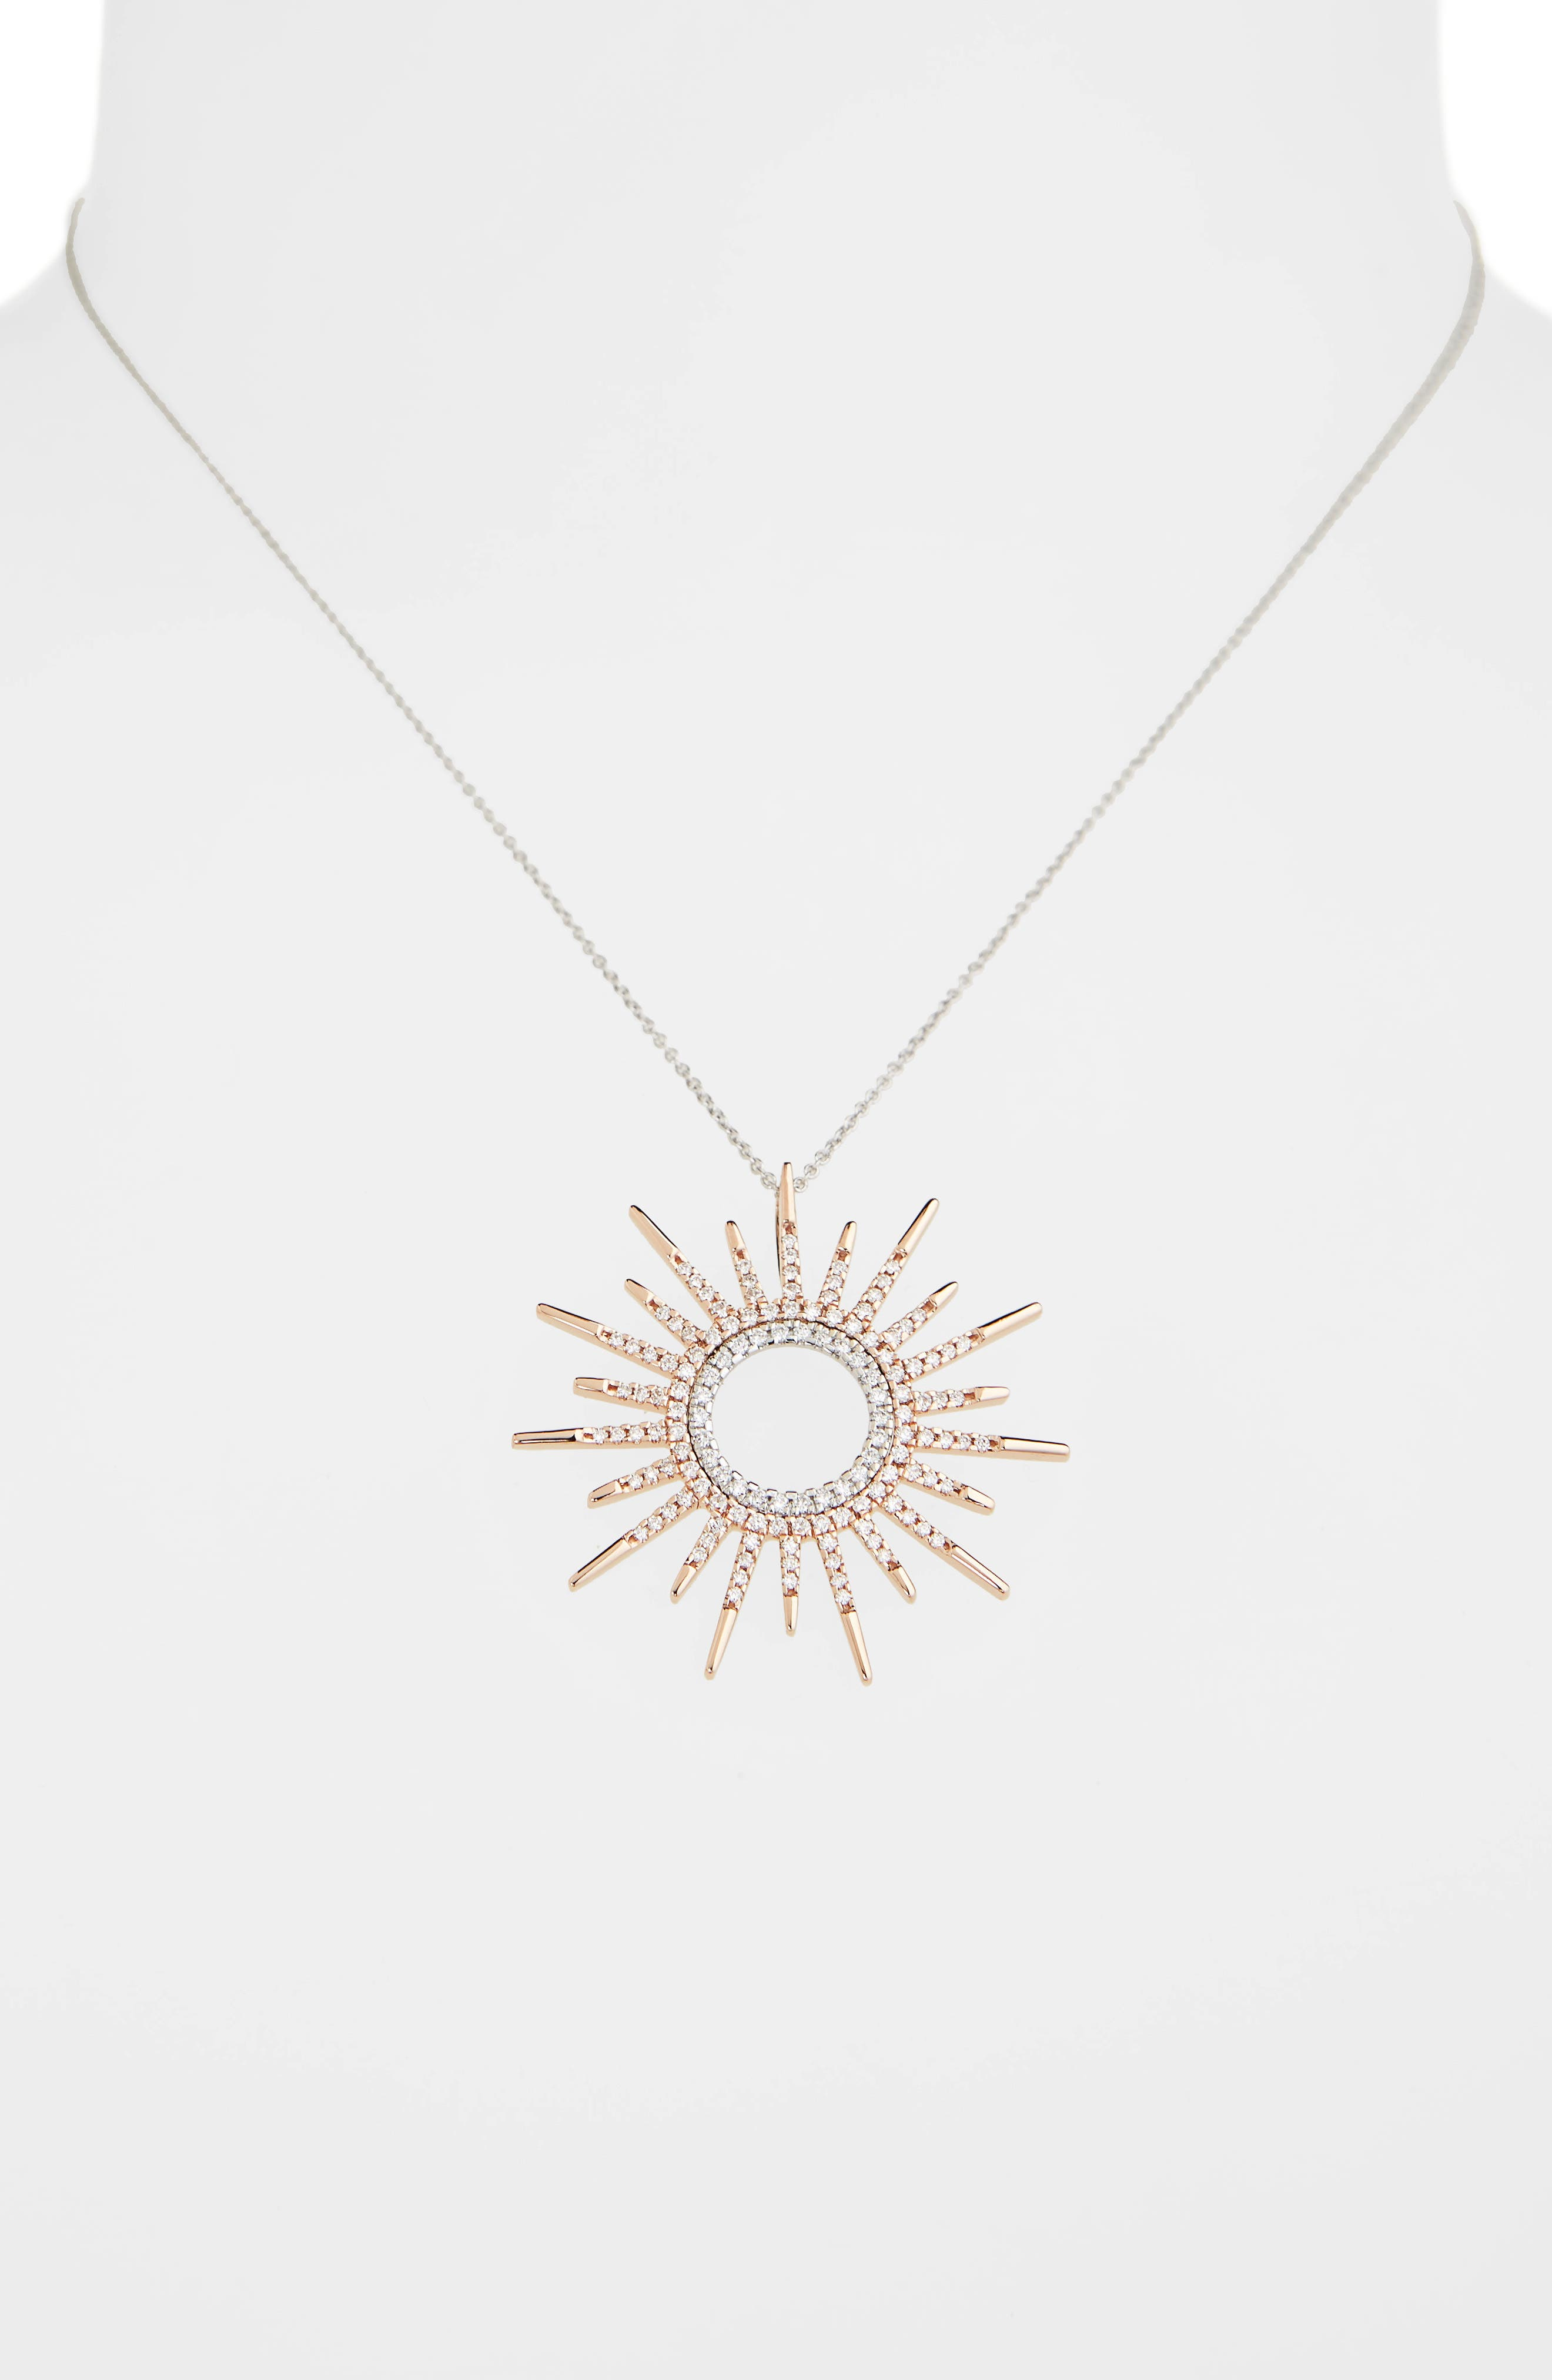 Diamond Sunburst Pendant Necklace,                             Alternate thumbnail 2, color,                             Rose Gold